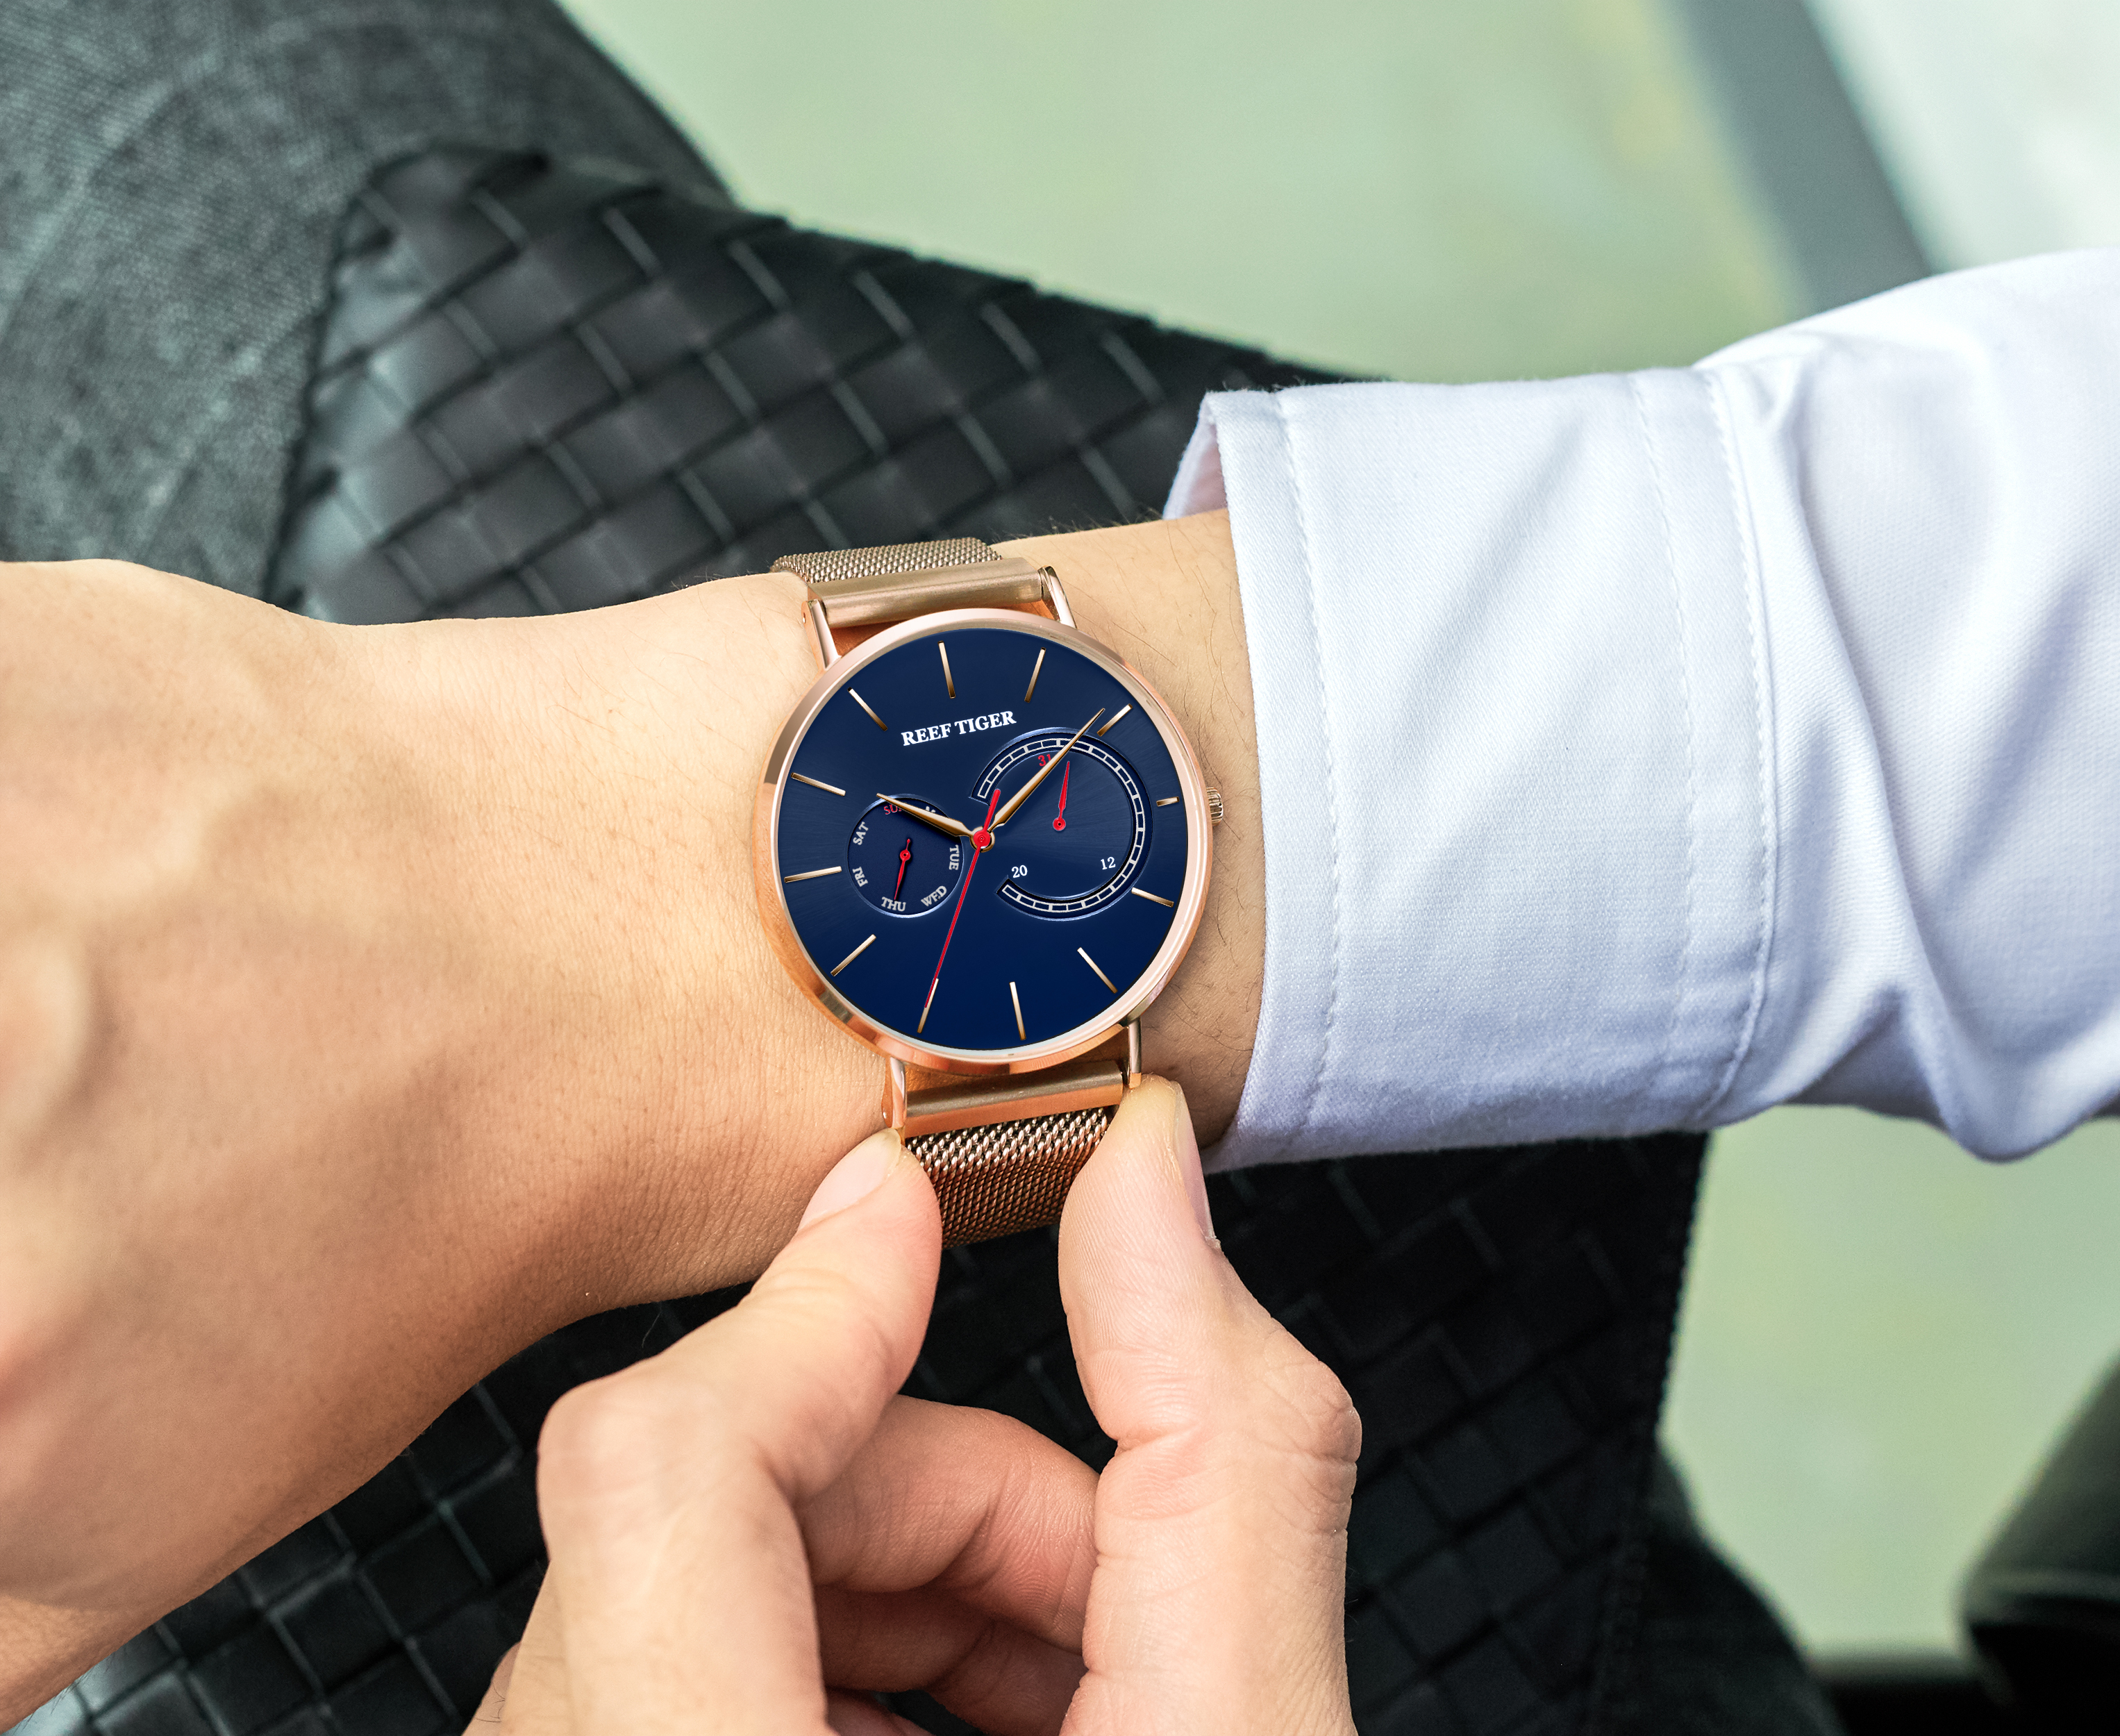 New Reef Tiger / RT Luxury Dress Watch Blue Dial Rose Gold Men Quartz Watch Men's Steel Watch RGA1664